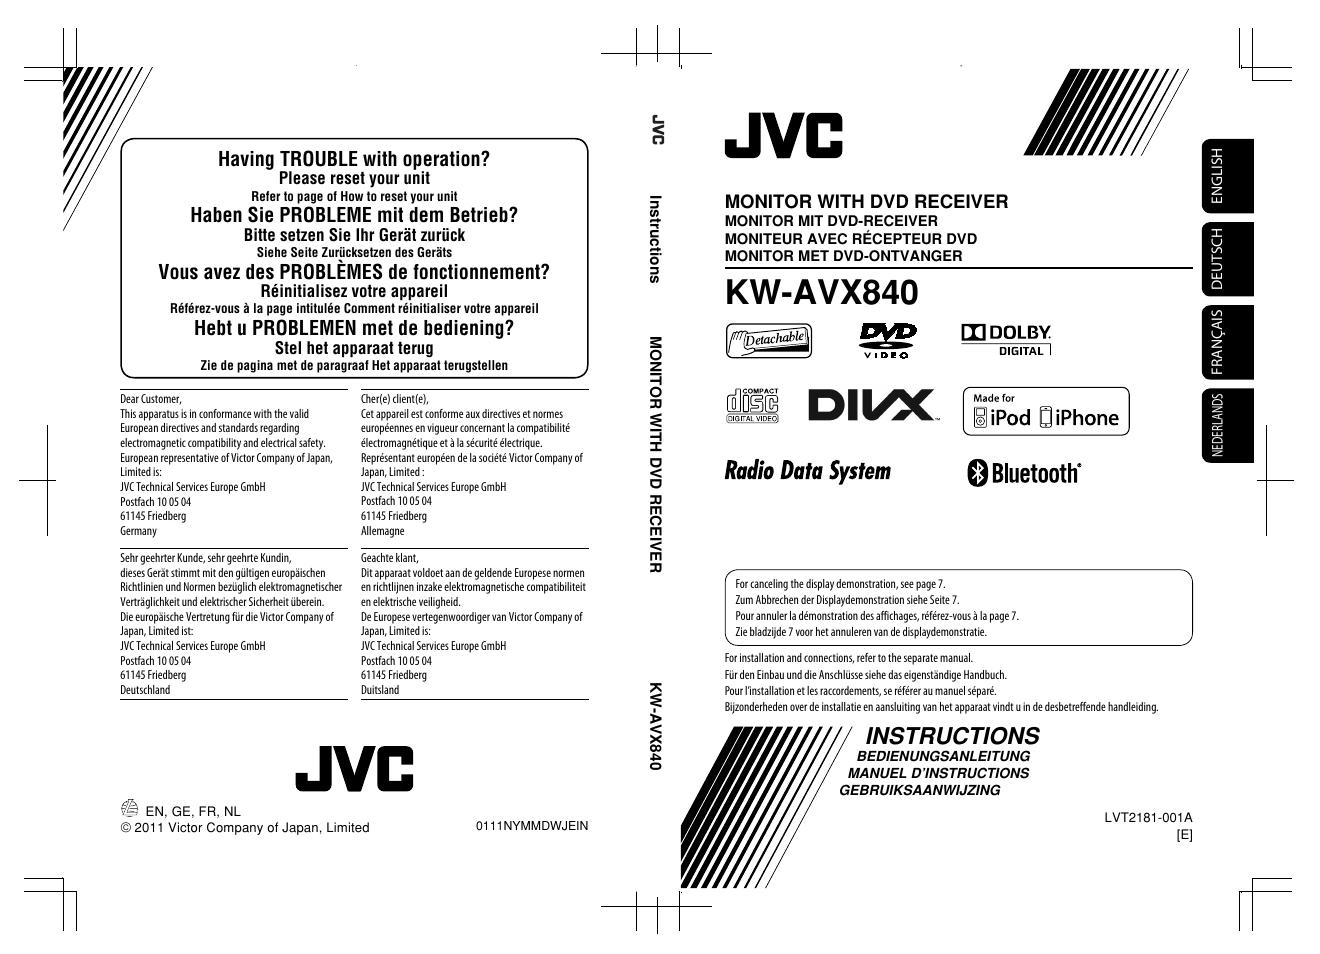 Jvc Avx840 Manual Wiring Diagrams Car Stereo Hd Radio R320 Diagram Array Kw User 261 Pages Rh Manualsdir